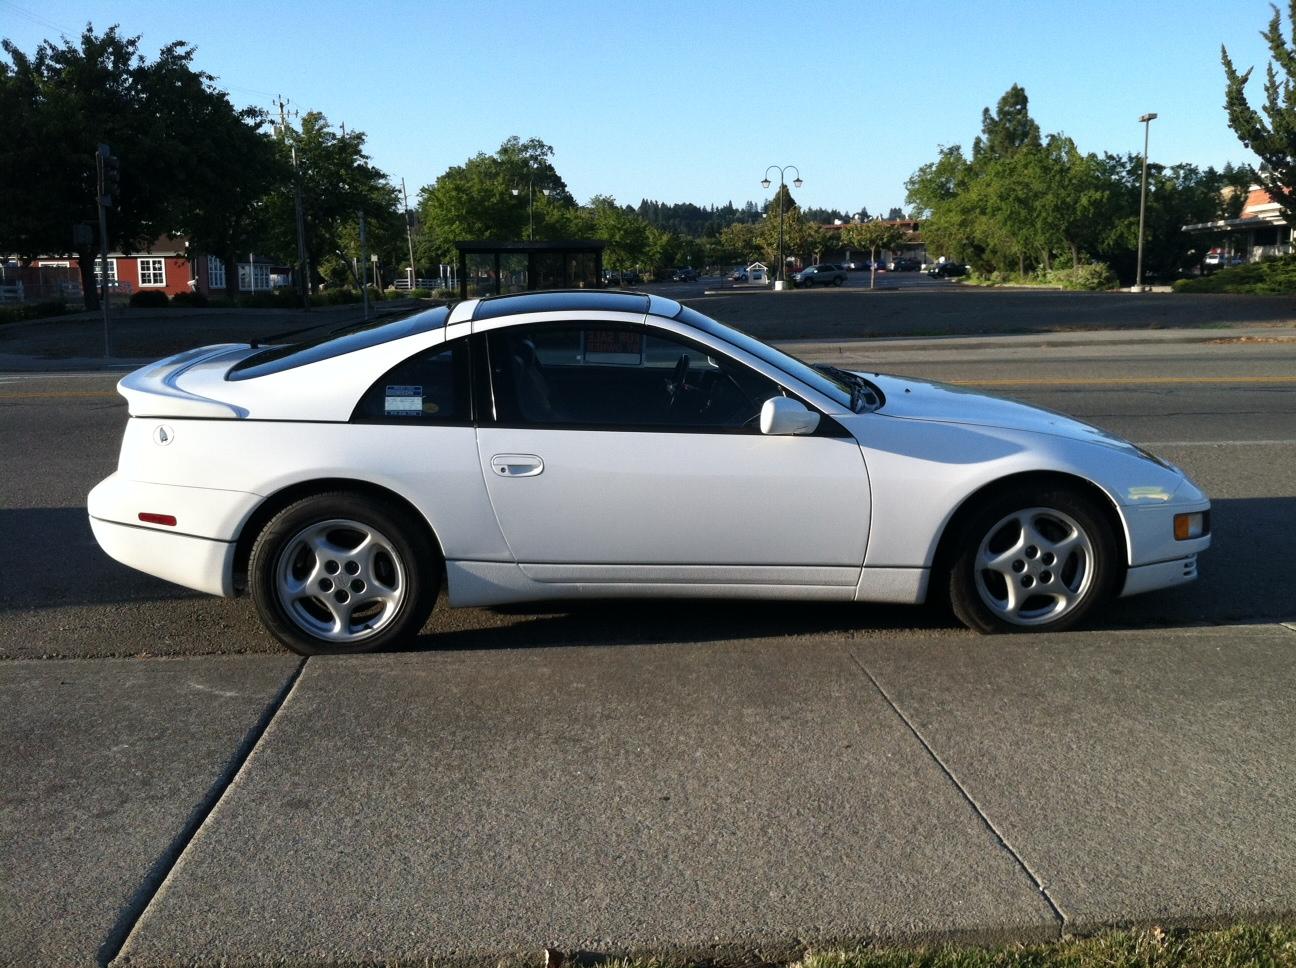 Nissan Walnut Creek >> Tamerlane's Thoughts: 1991 Nissan 300ZX Twin Turbo for sale